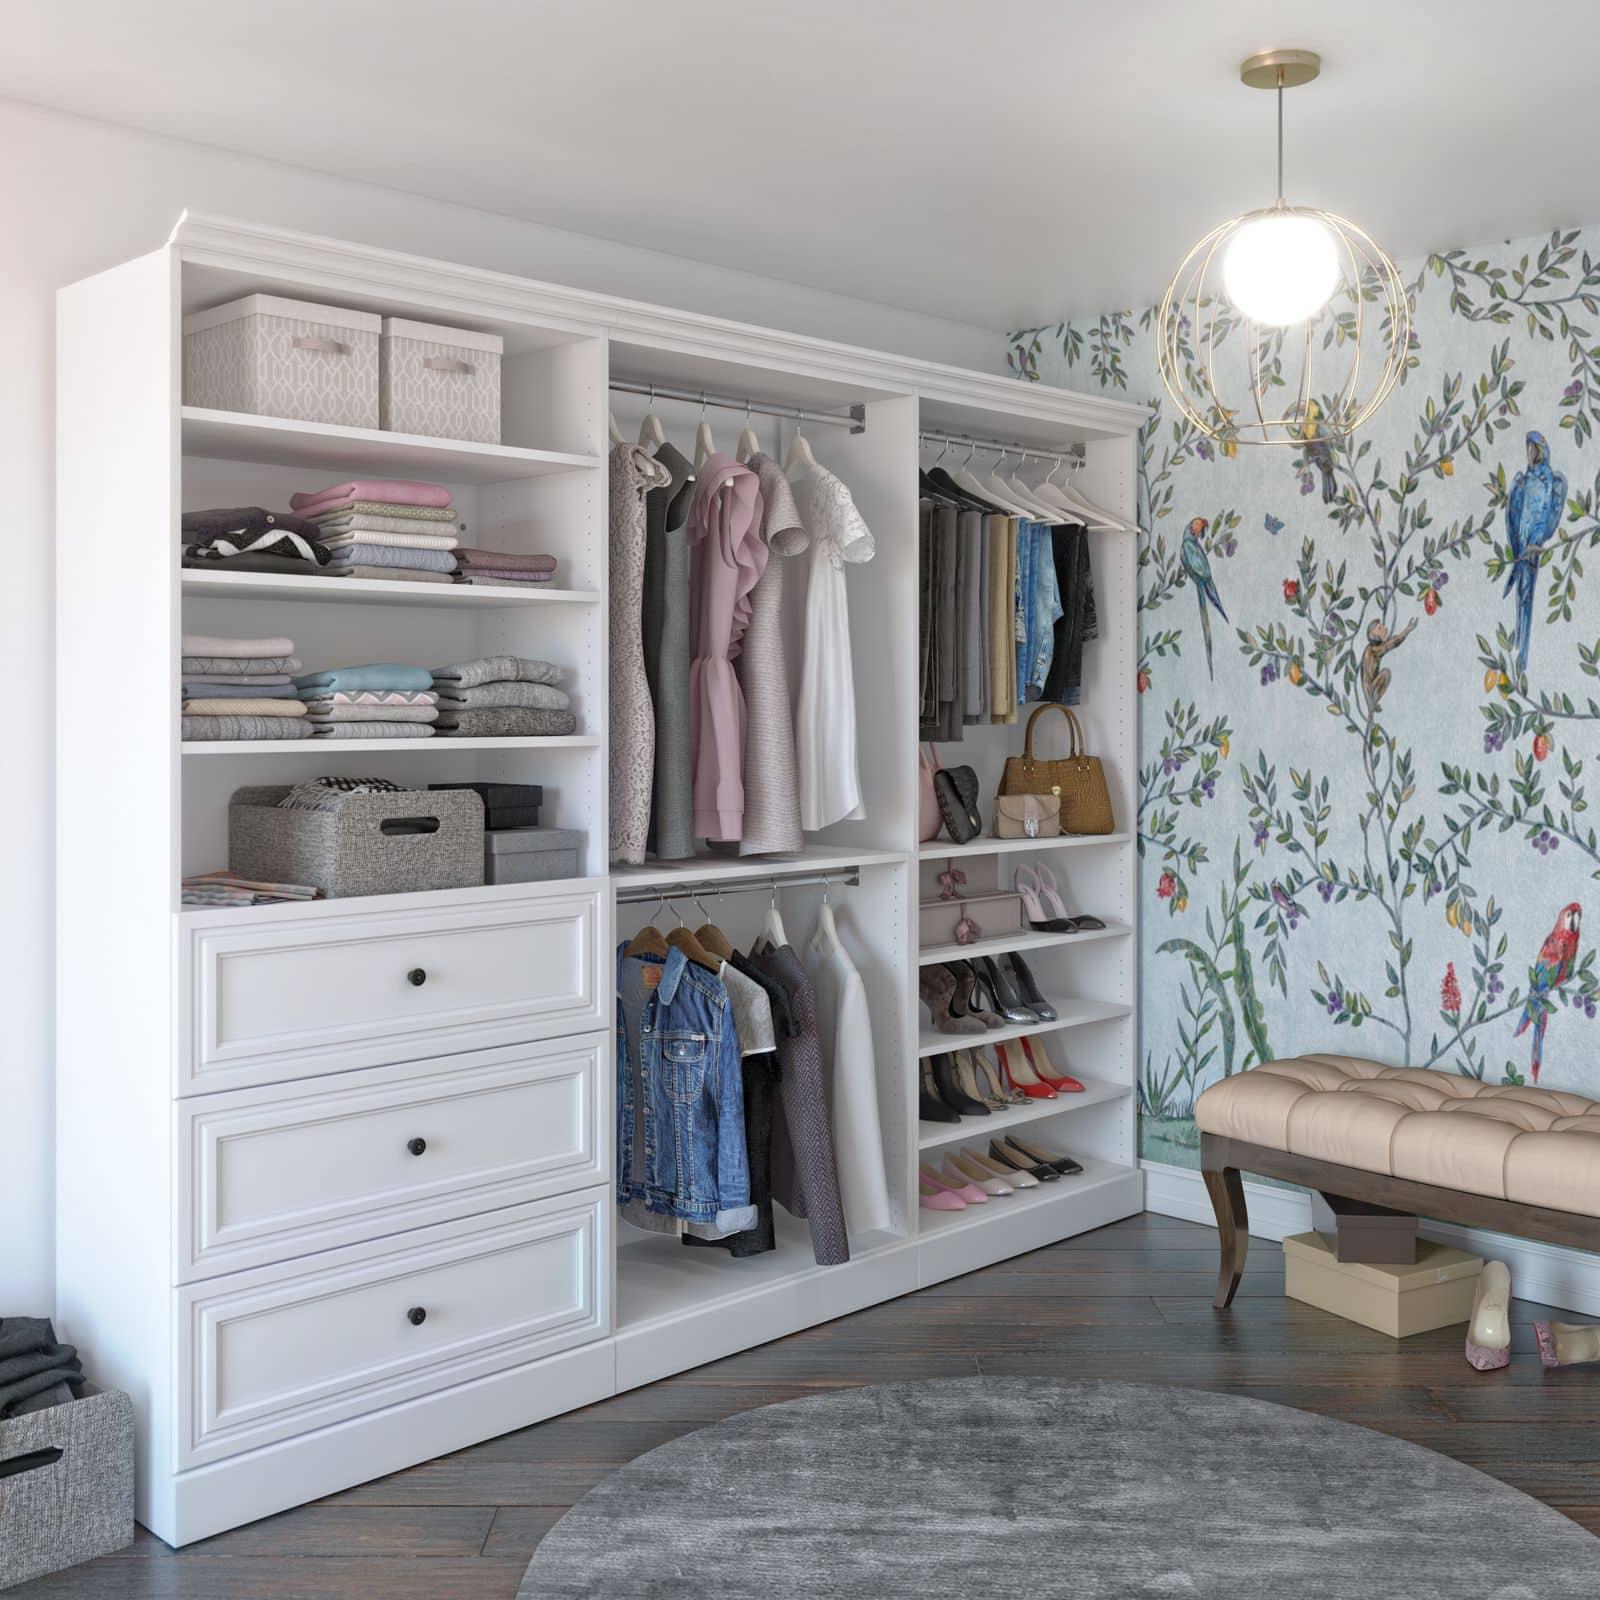 Bestar closet organizer